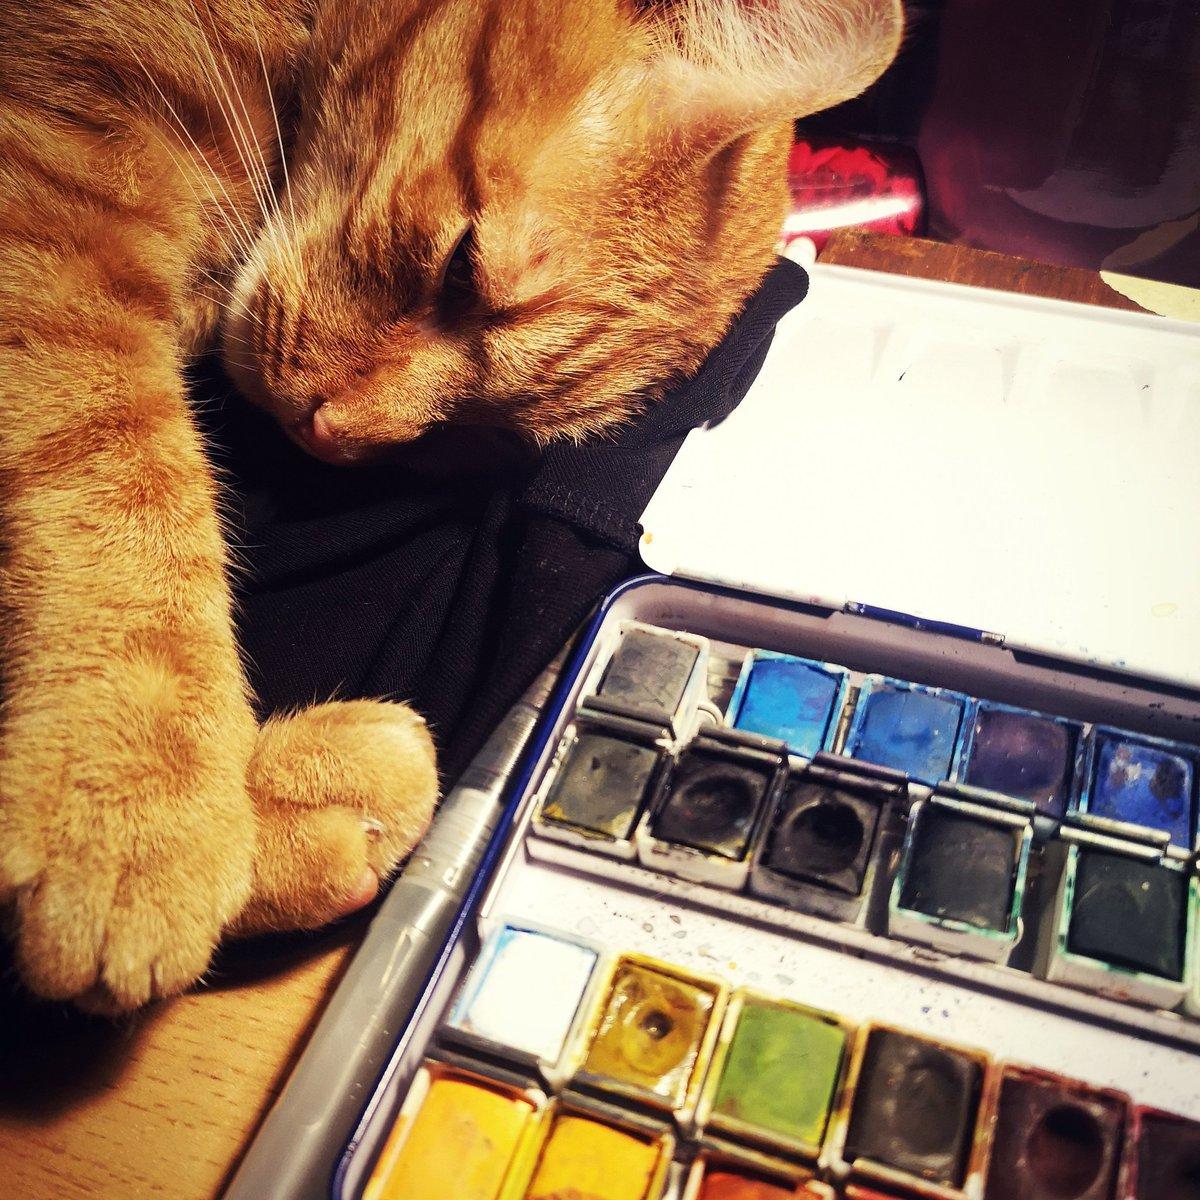 Best art assistant 🖤 My little sweetheart, Tormund #artistsontwitter #artshare #CatsOnTwitter #cat